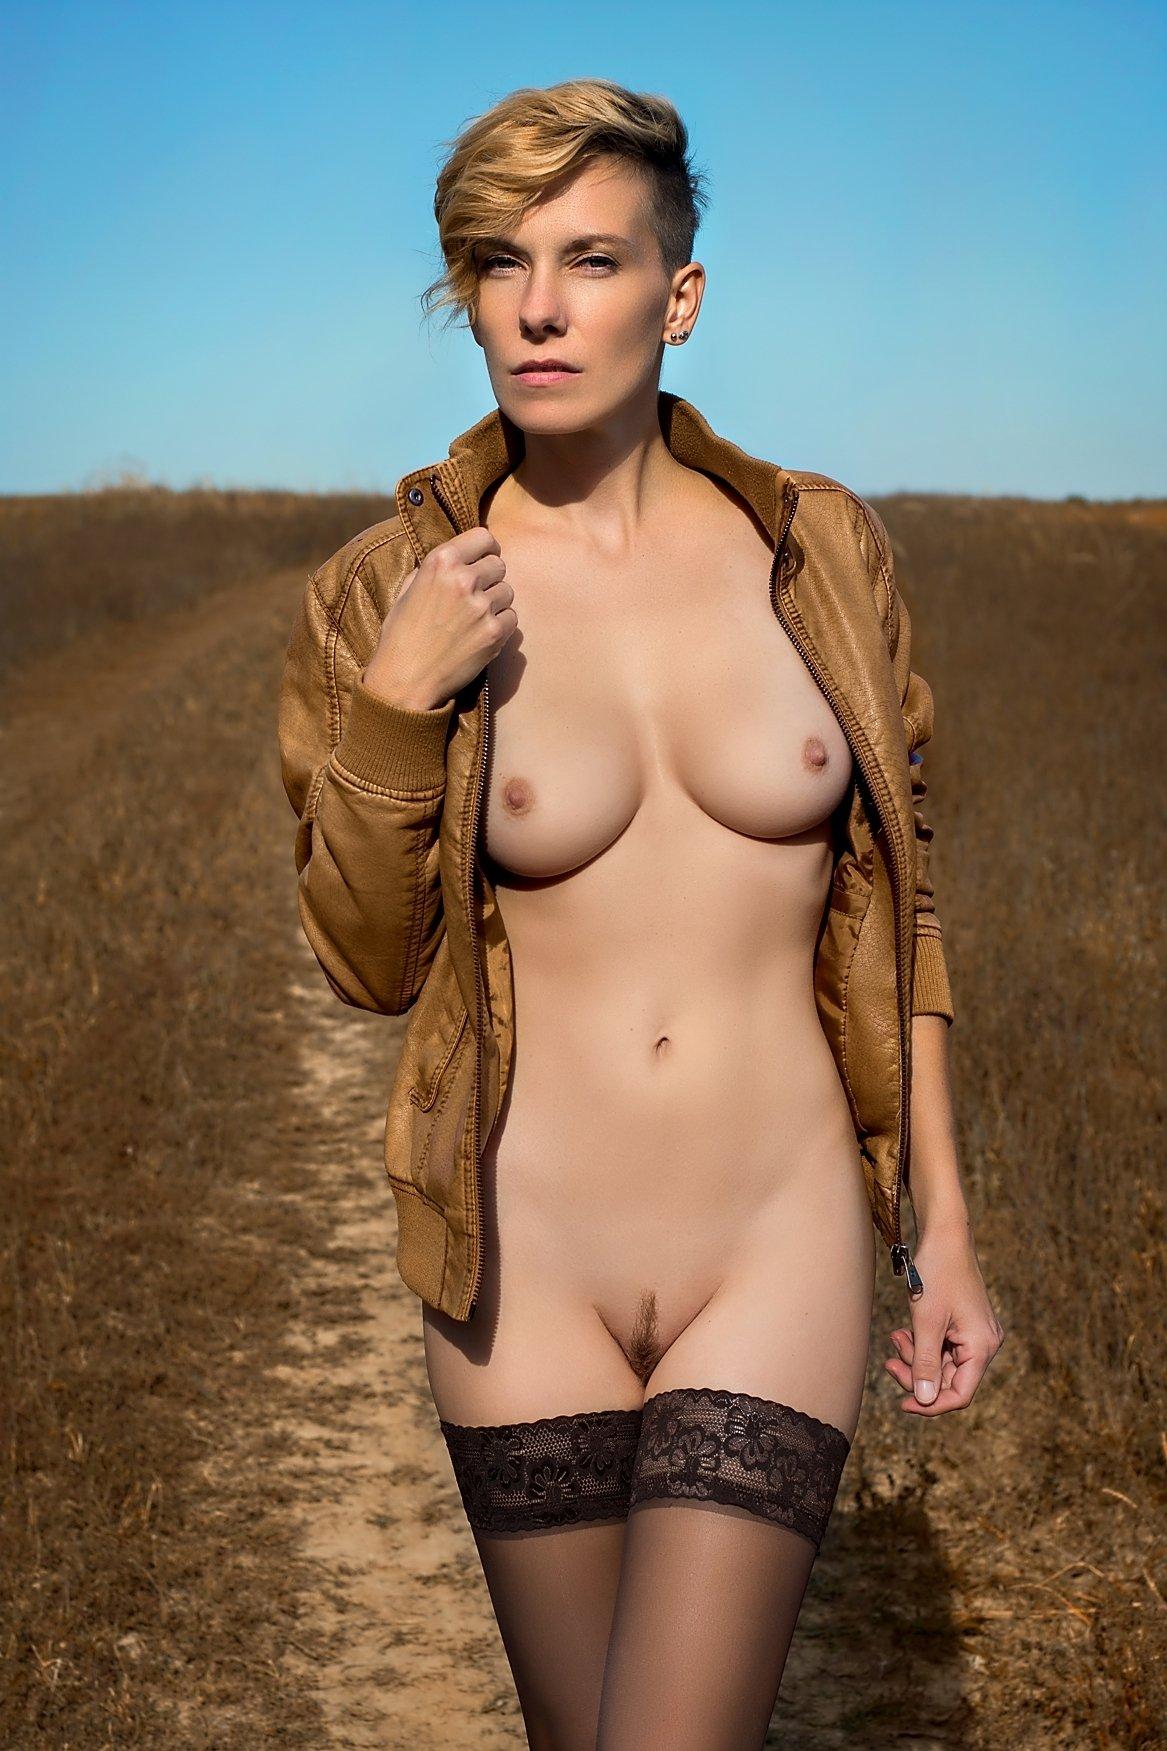 model, nude, naked, glamour, woman, female, colour, body, sexy, sensual, natural light, curves, portrait, erotica, fine art, fashion, autumn,, Lajos Csáki